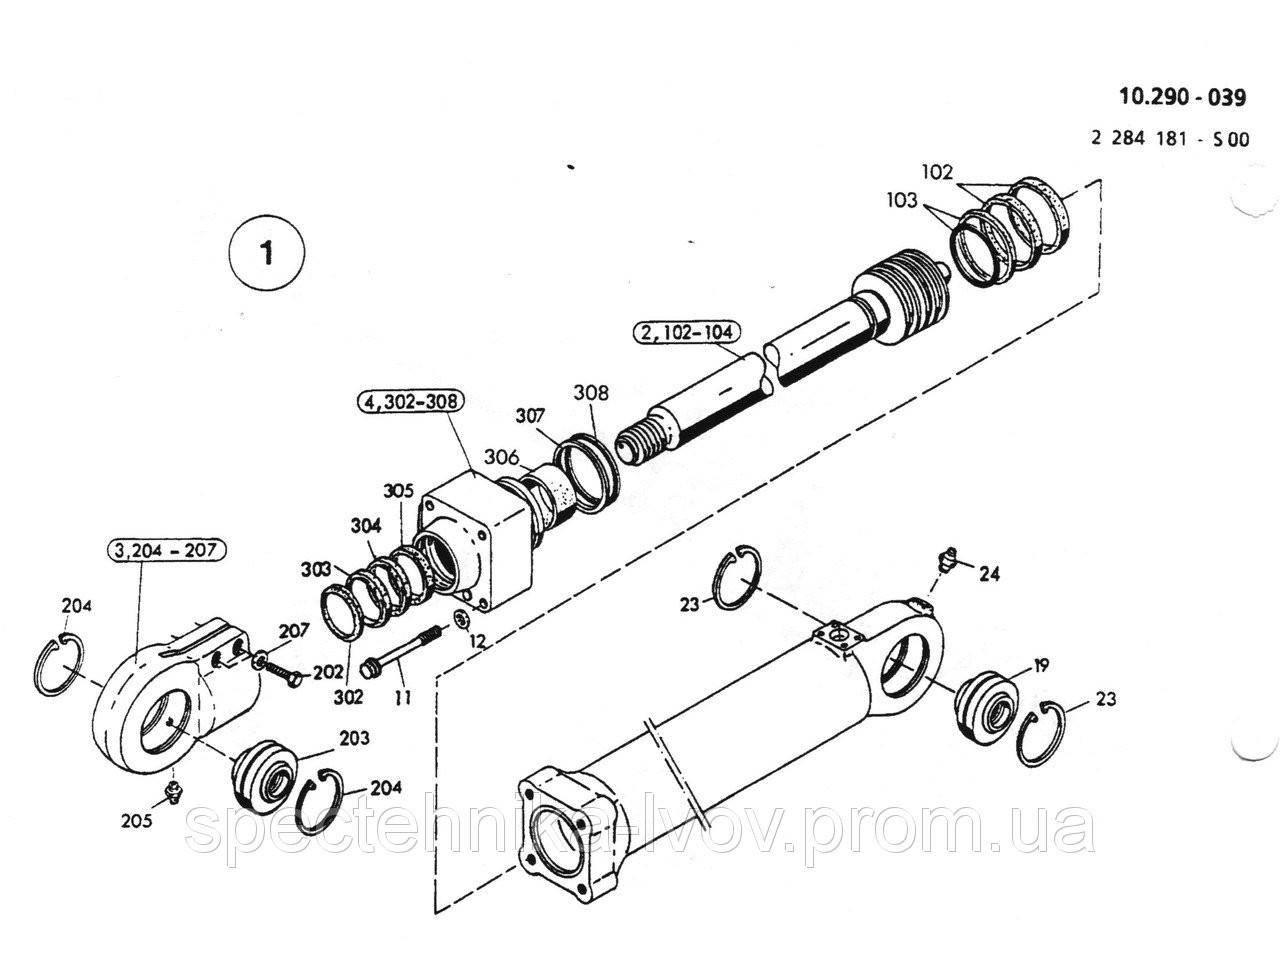 2532109 Ремкомплект гидроцилиндра отвала O&K (Orenstein & Koppel) MH Plus